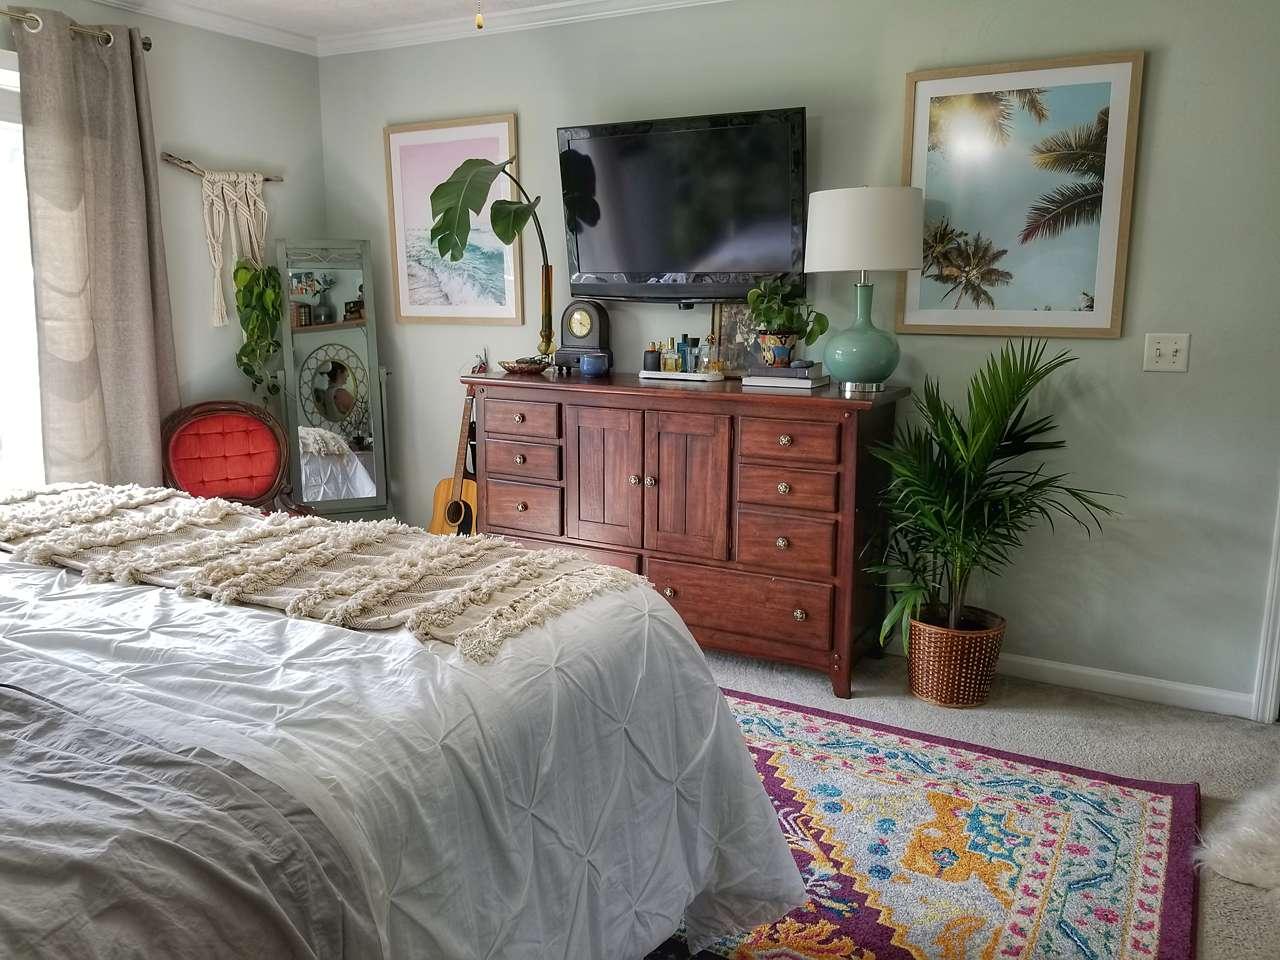 Eye level bedroom decor